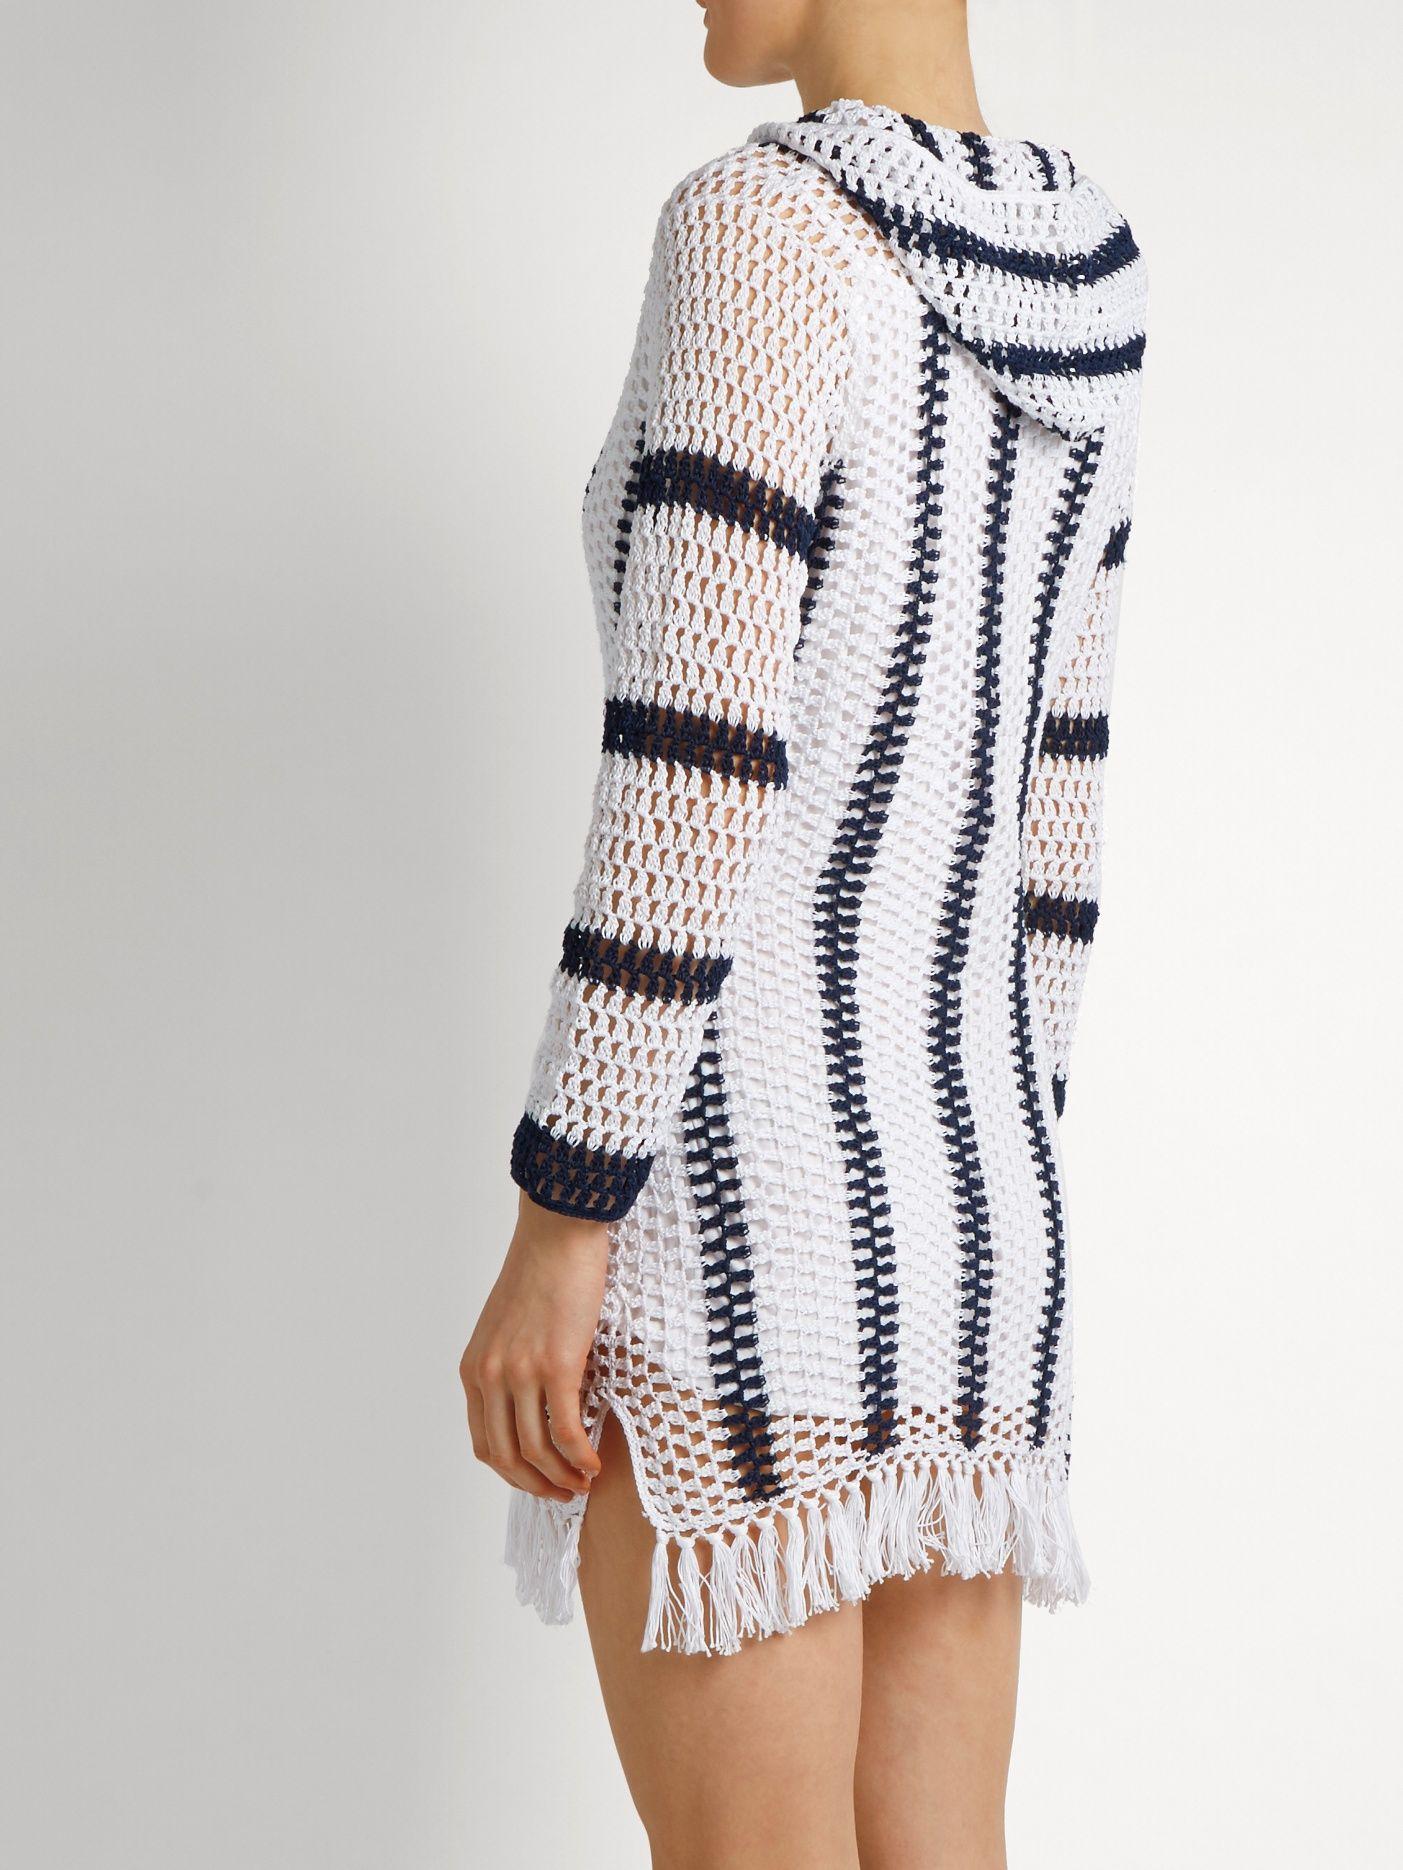 Click here to buy Anna Kosturova Cape Cod striped-crochet hooded dress at MATCHESFASHION.COM